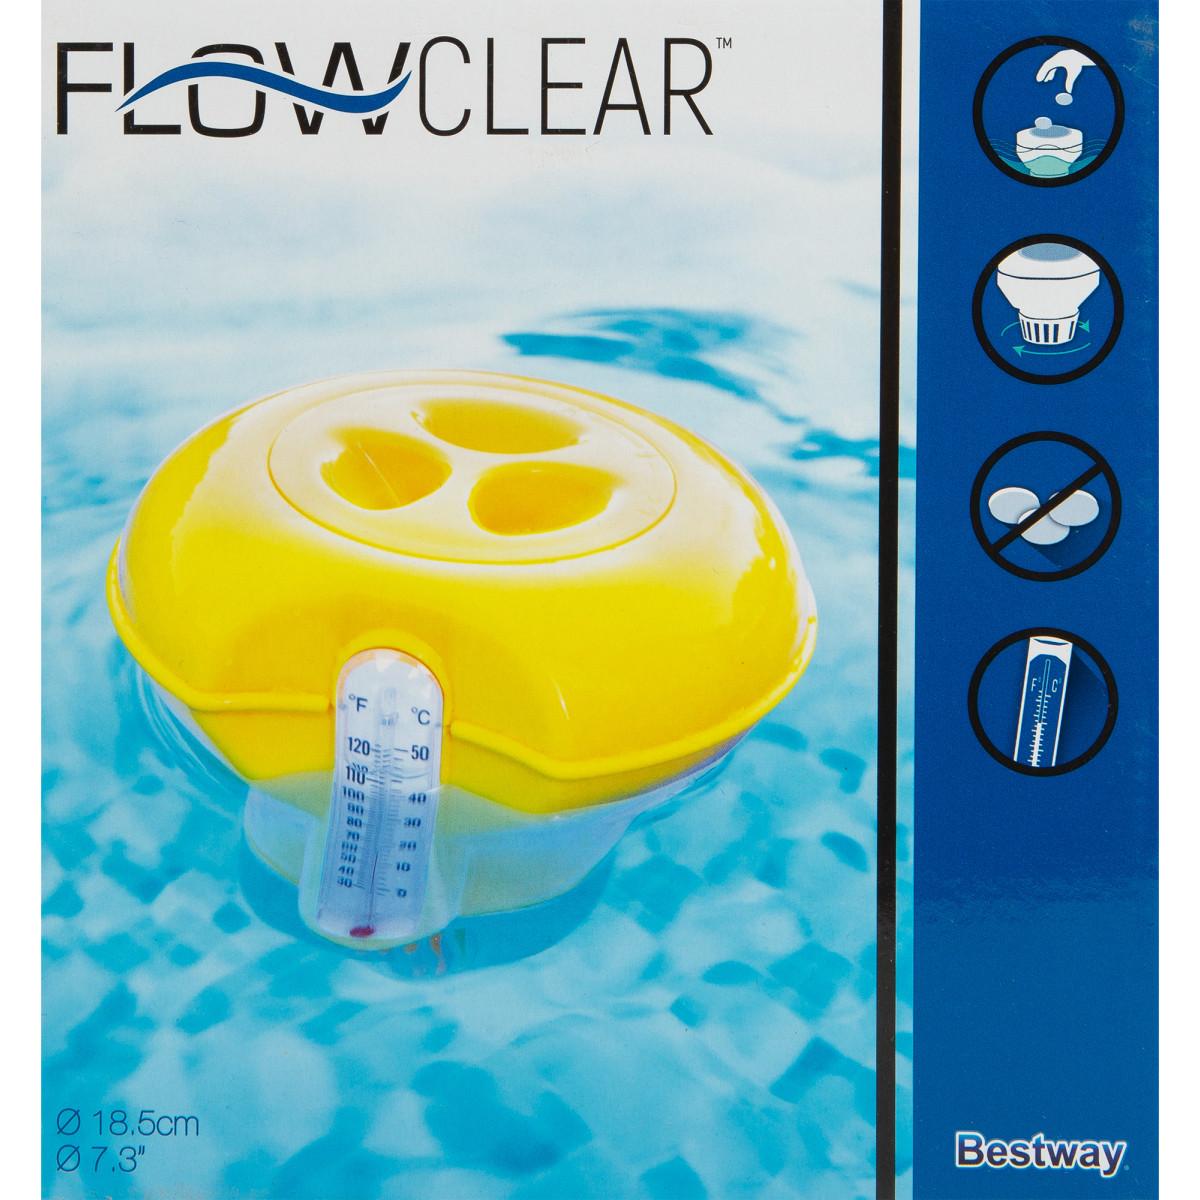 Дозатор плавающий с термометром